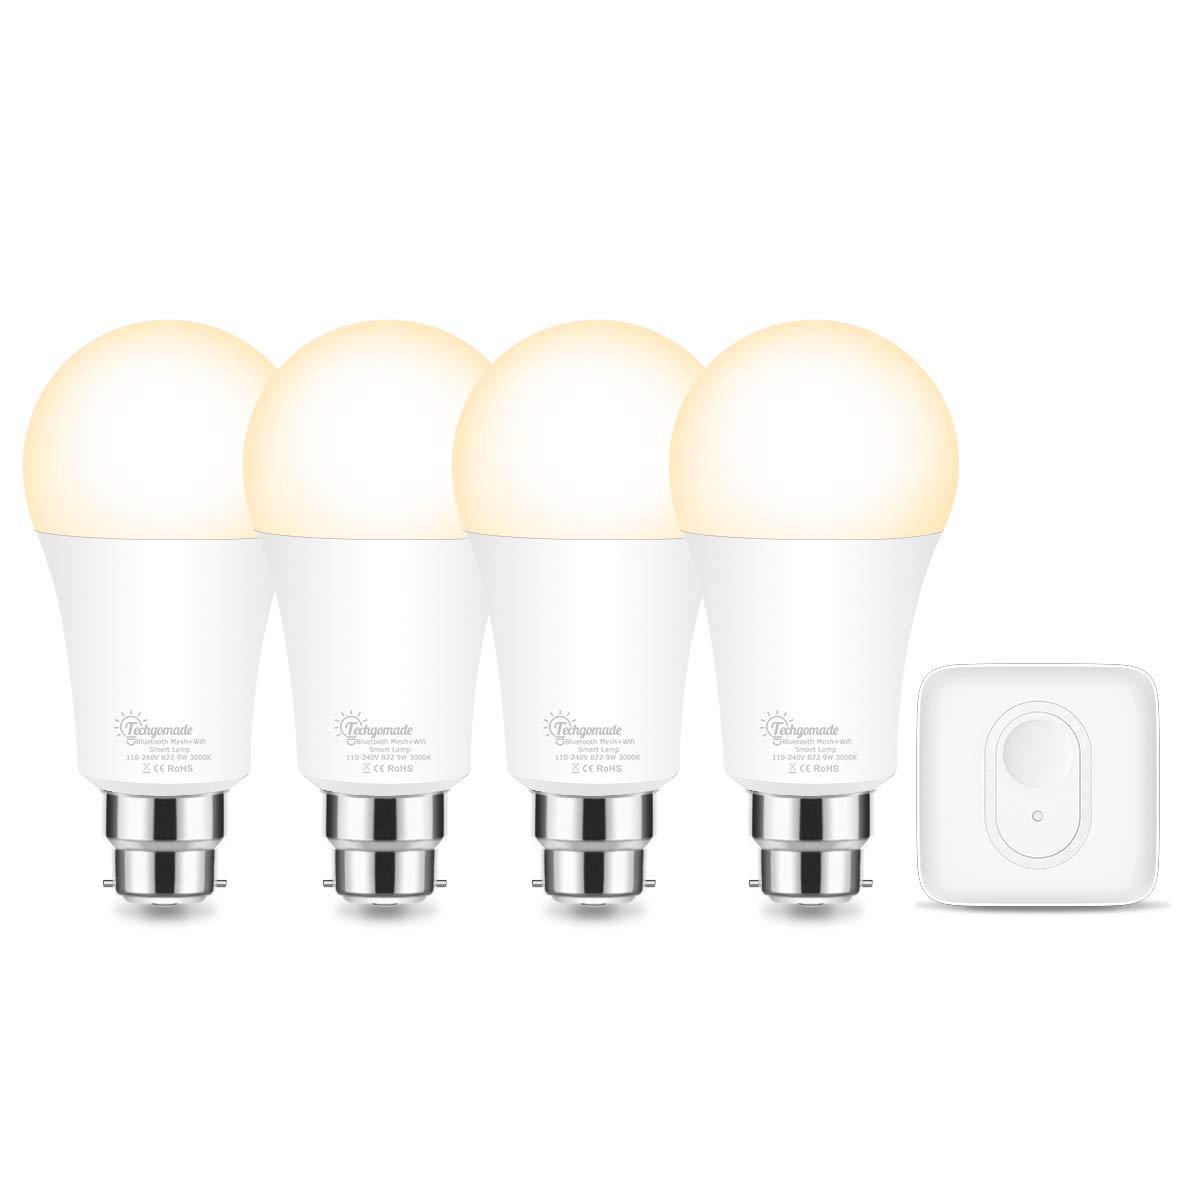 WiFi Smart Bulb B22, Techgomade Warm White 3000K Smart Light Bulbs